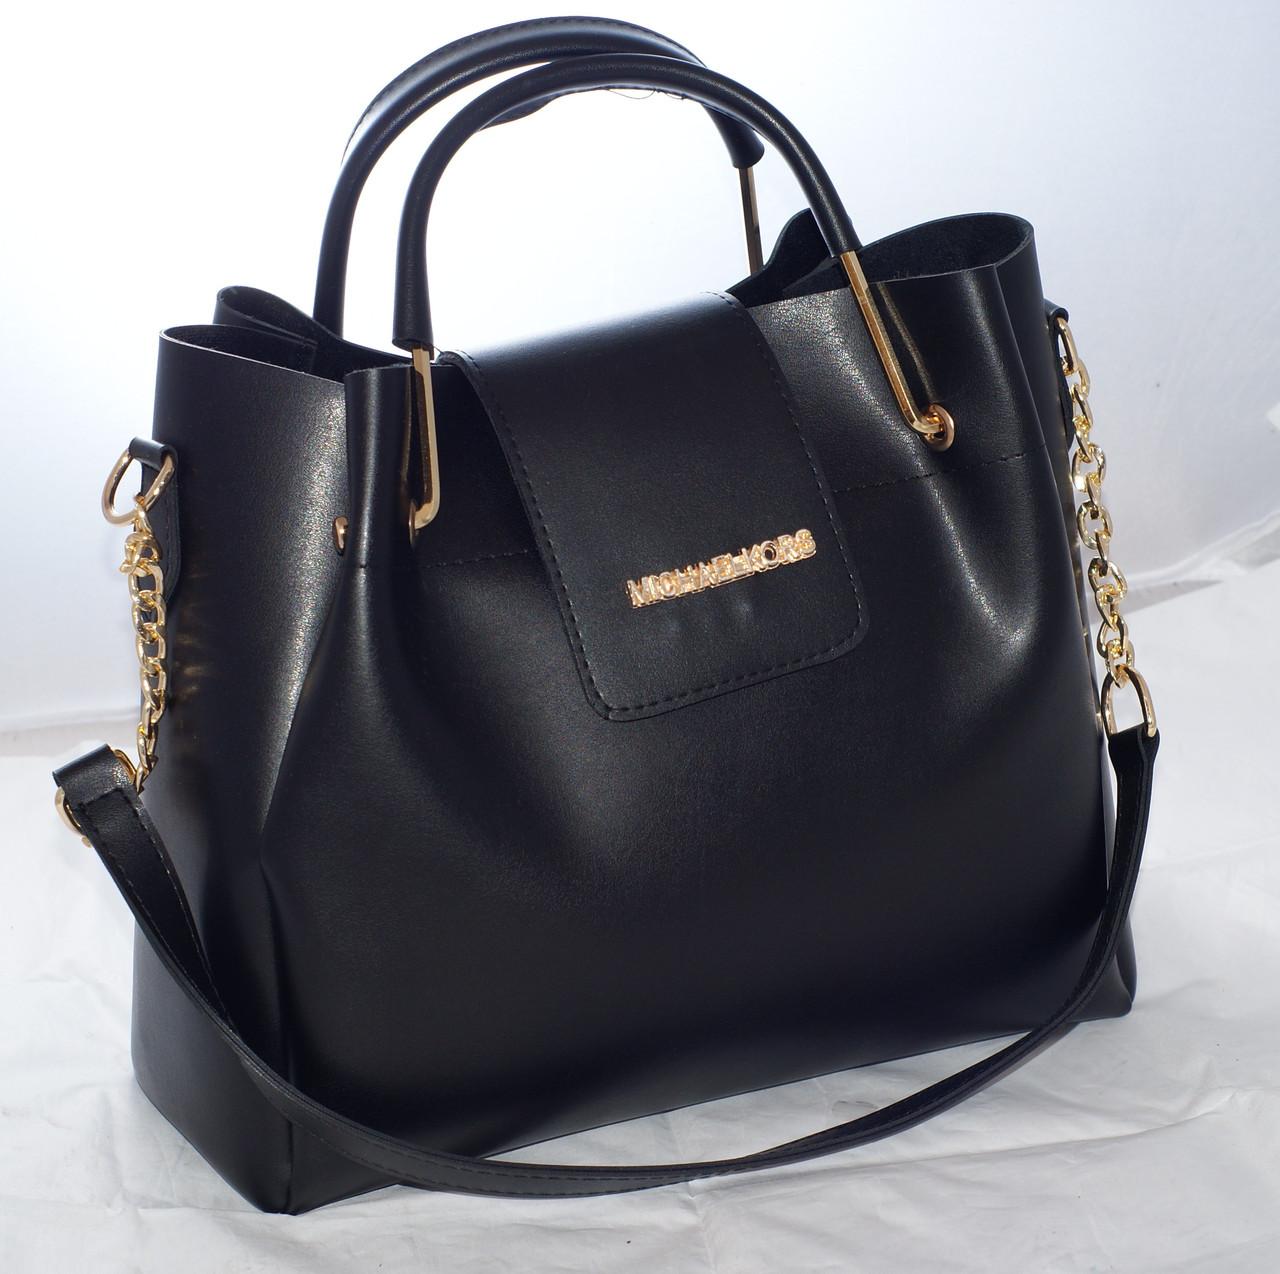 Женская сумка Michael Kors (Майкл Корс), черная  продажа, цена в ... ad108c09d9f